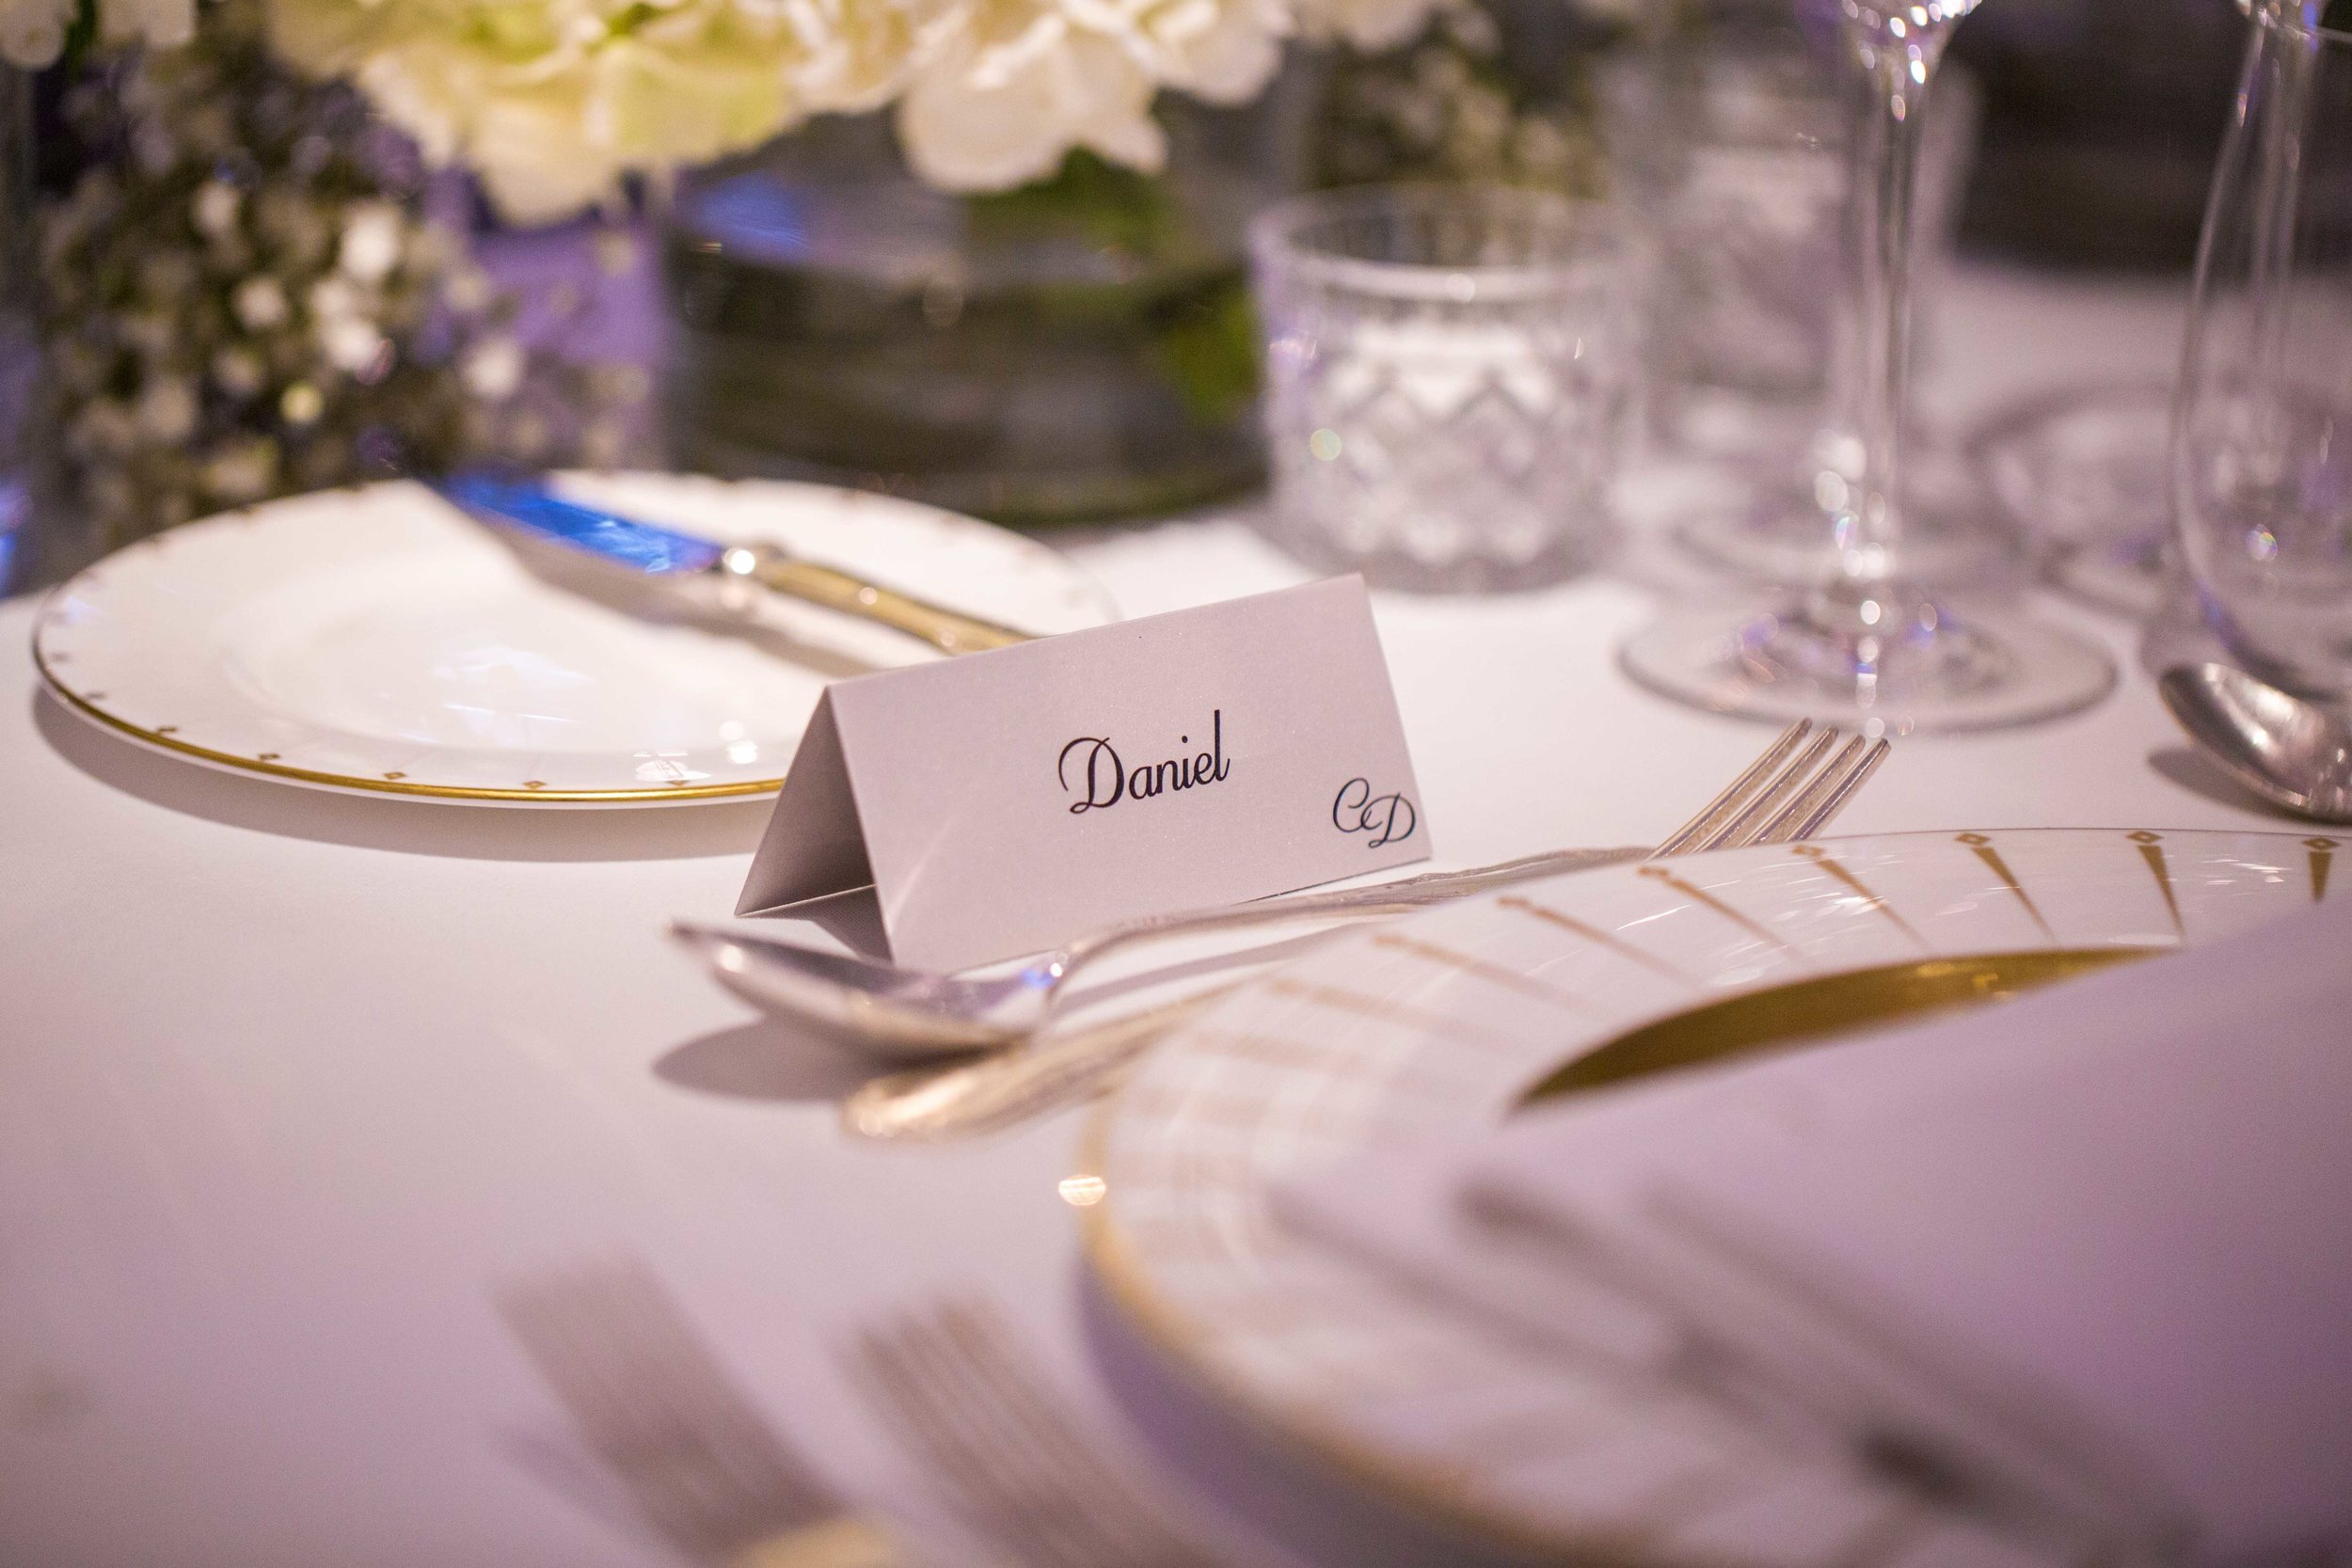 claridges-hotel-wedding-photographer-london-mayfair-natalia-smith-photography-85.jpg